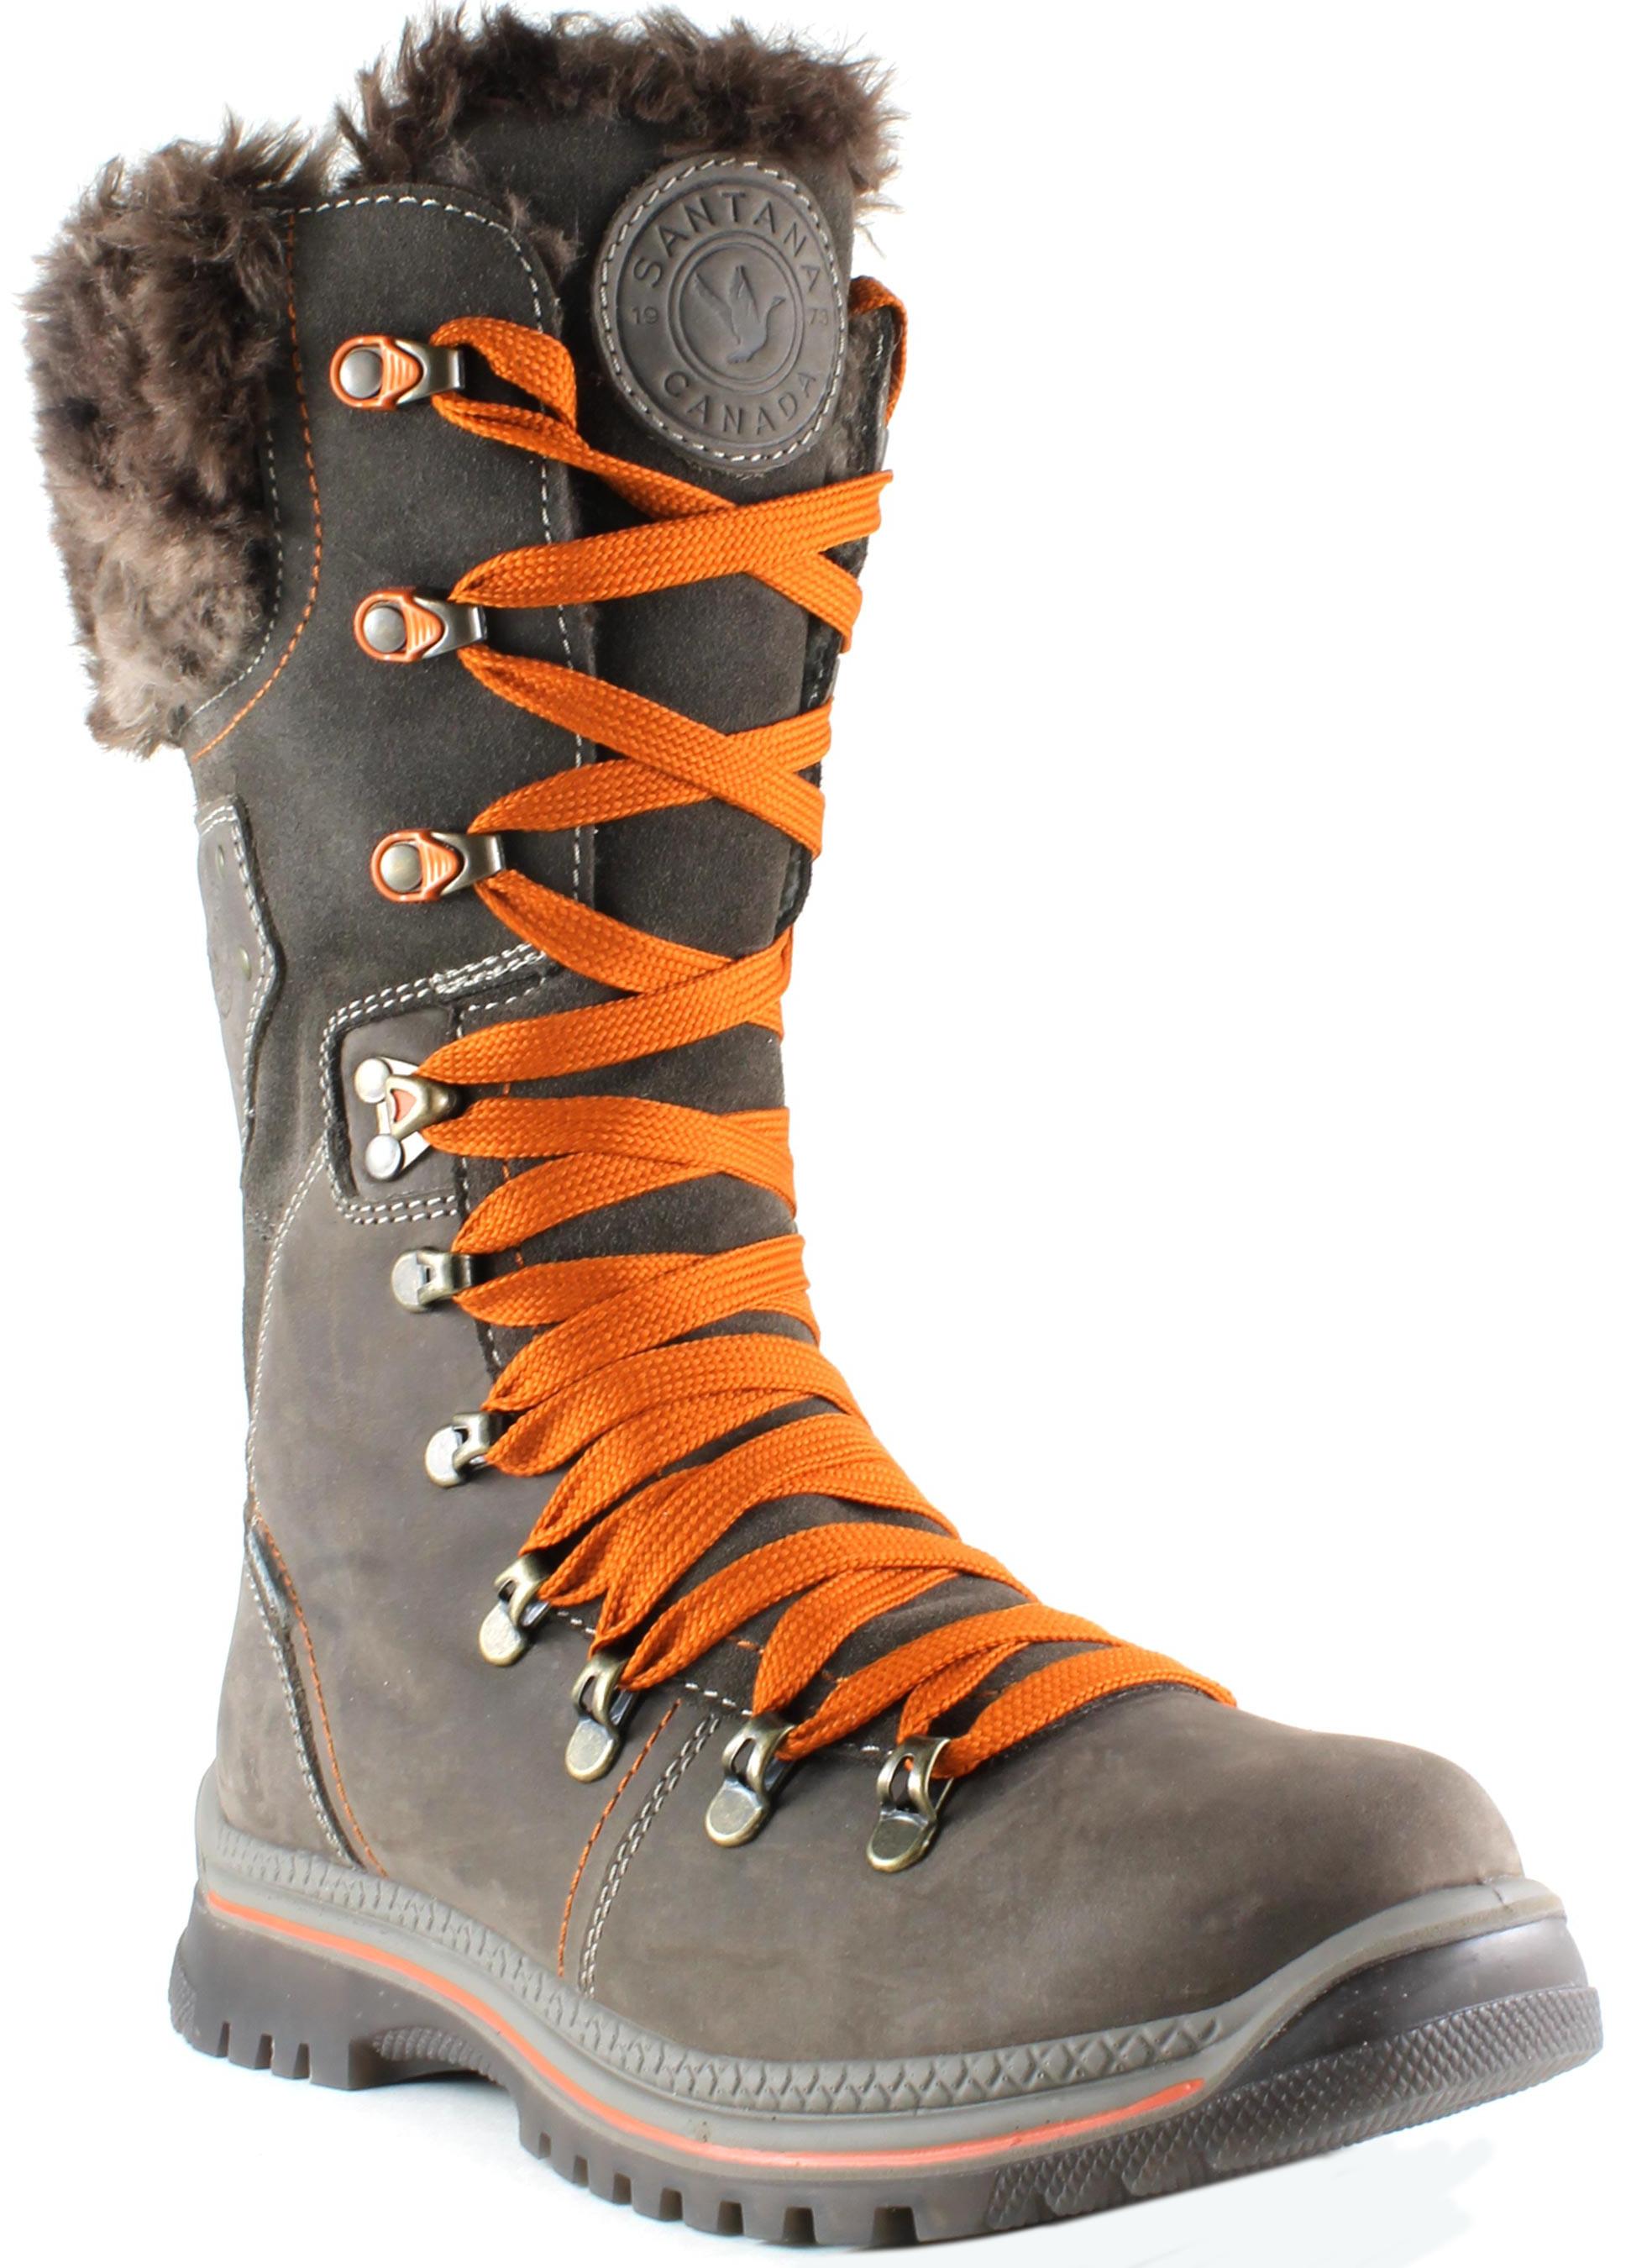 fa002e4c56784 Santana Canada Melita3 Winter Boot - Women's | 5 Star Rating w/ Free  Shipping and Handling